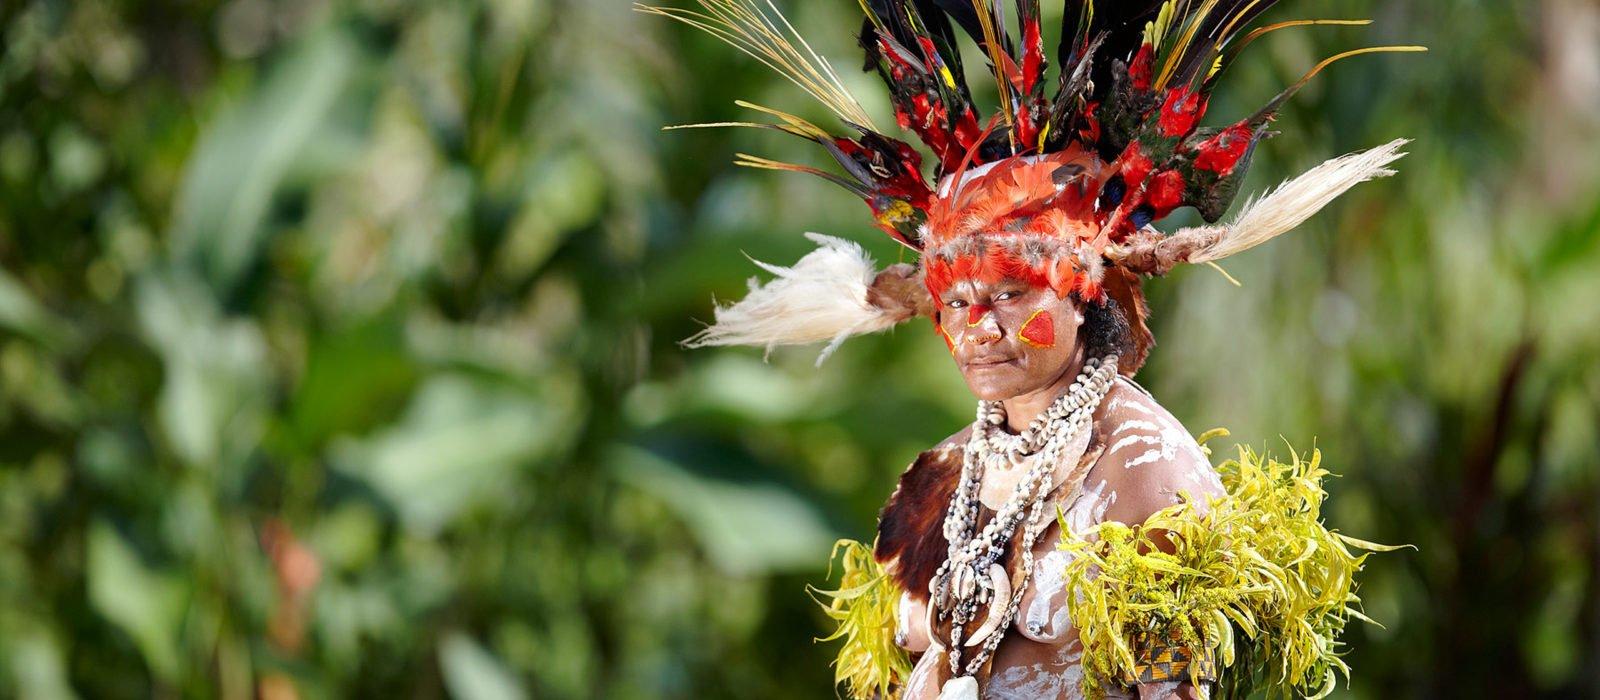 rondon-ridge-culture-papua-new-guinea